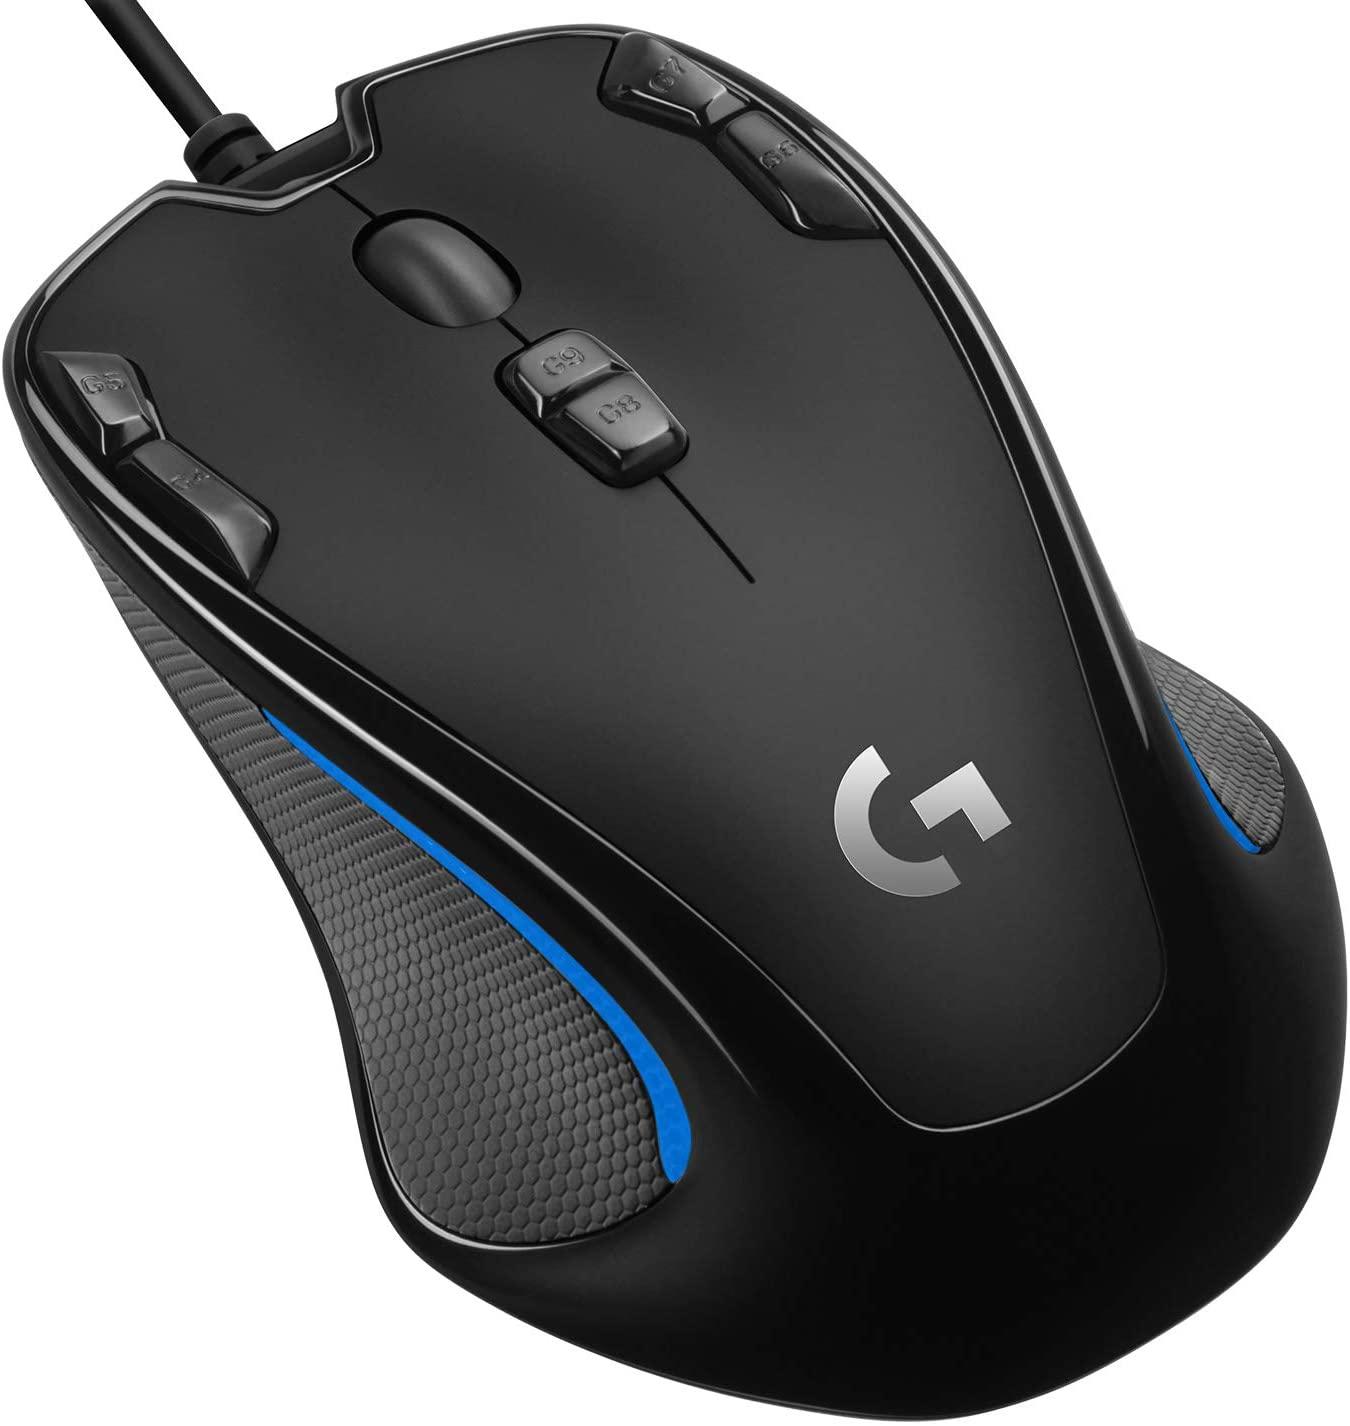 Mouse Logitech G300s RGB-2500 DPI 23.8€